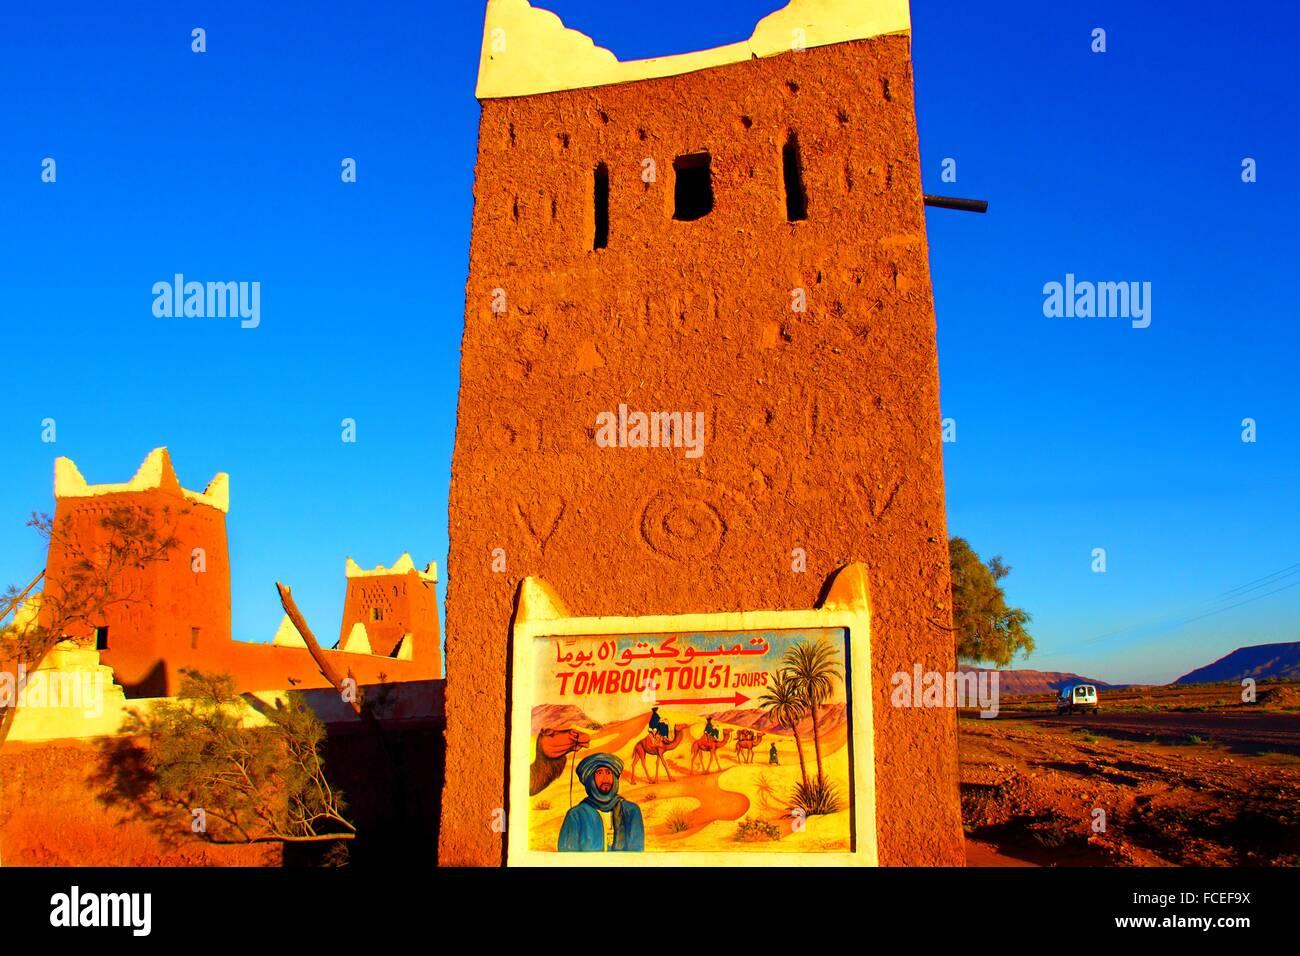 Tinfou, 51 days from Timbuktu on camel back, Zagora province, Morocco - Stock Image